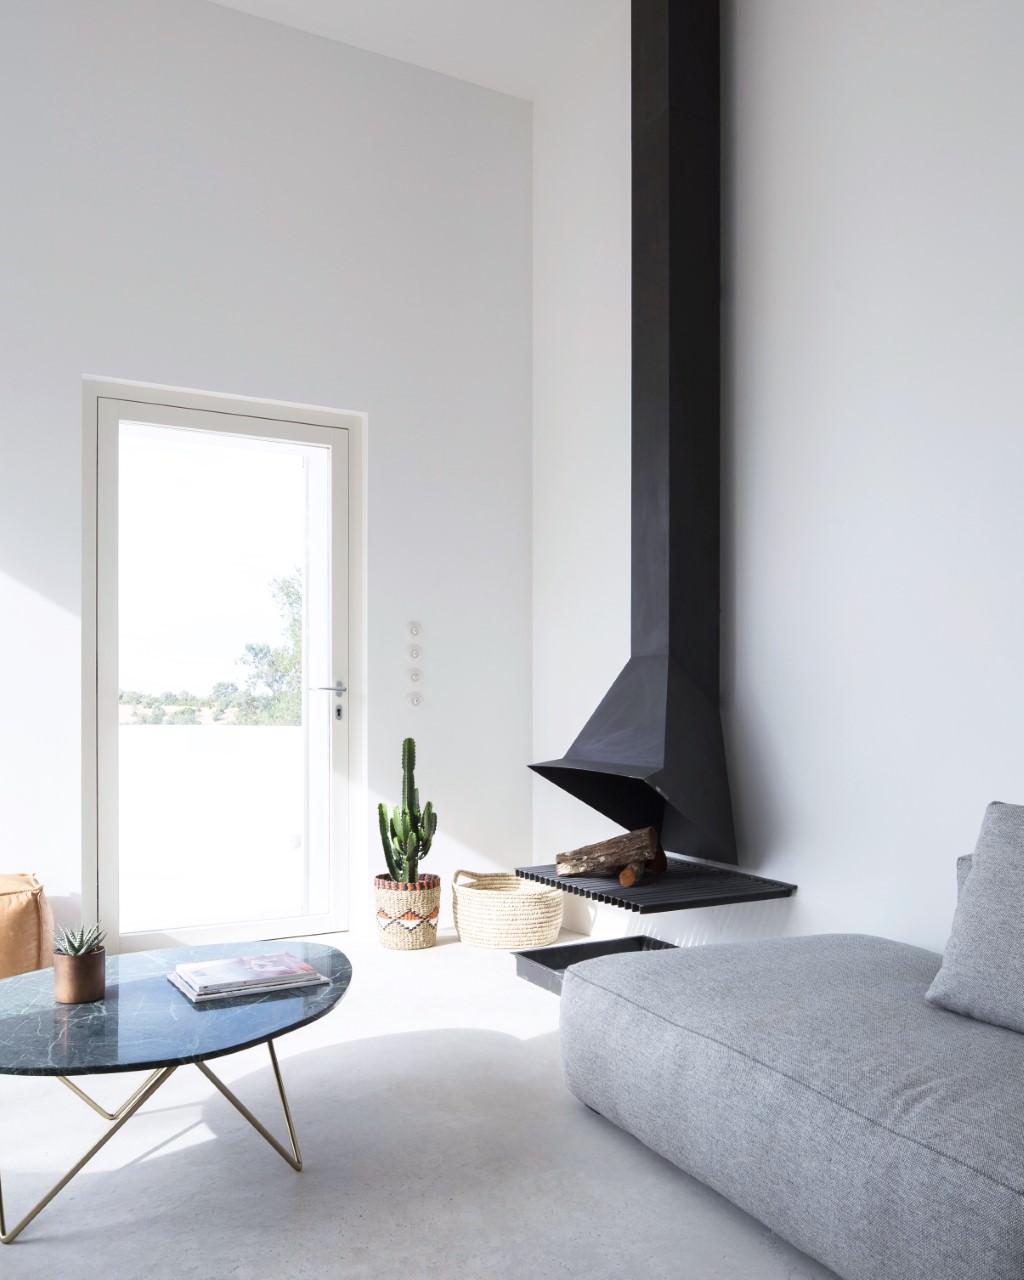 Zalig-Algarve-Casa-Luum-248-1_1